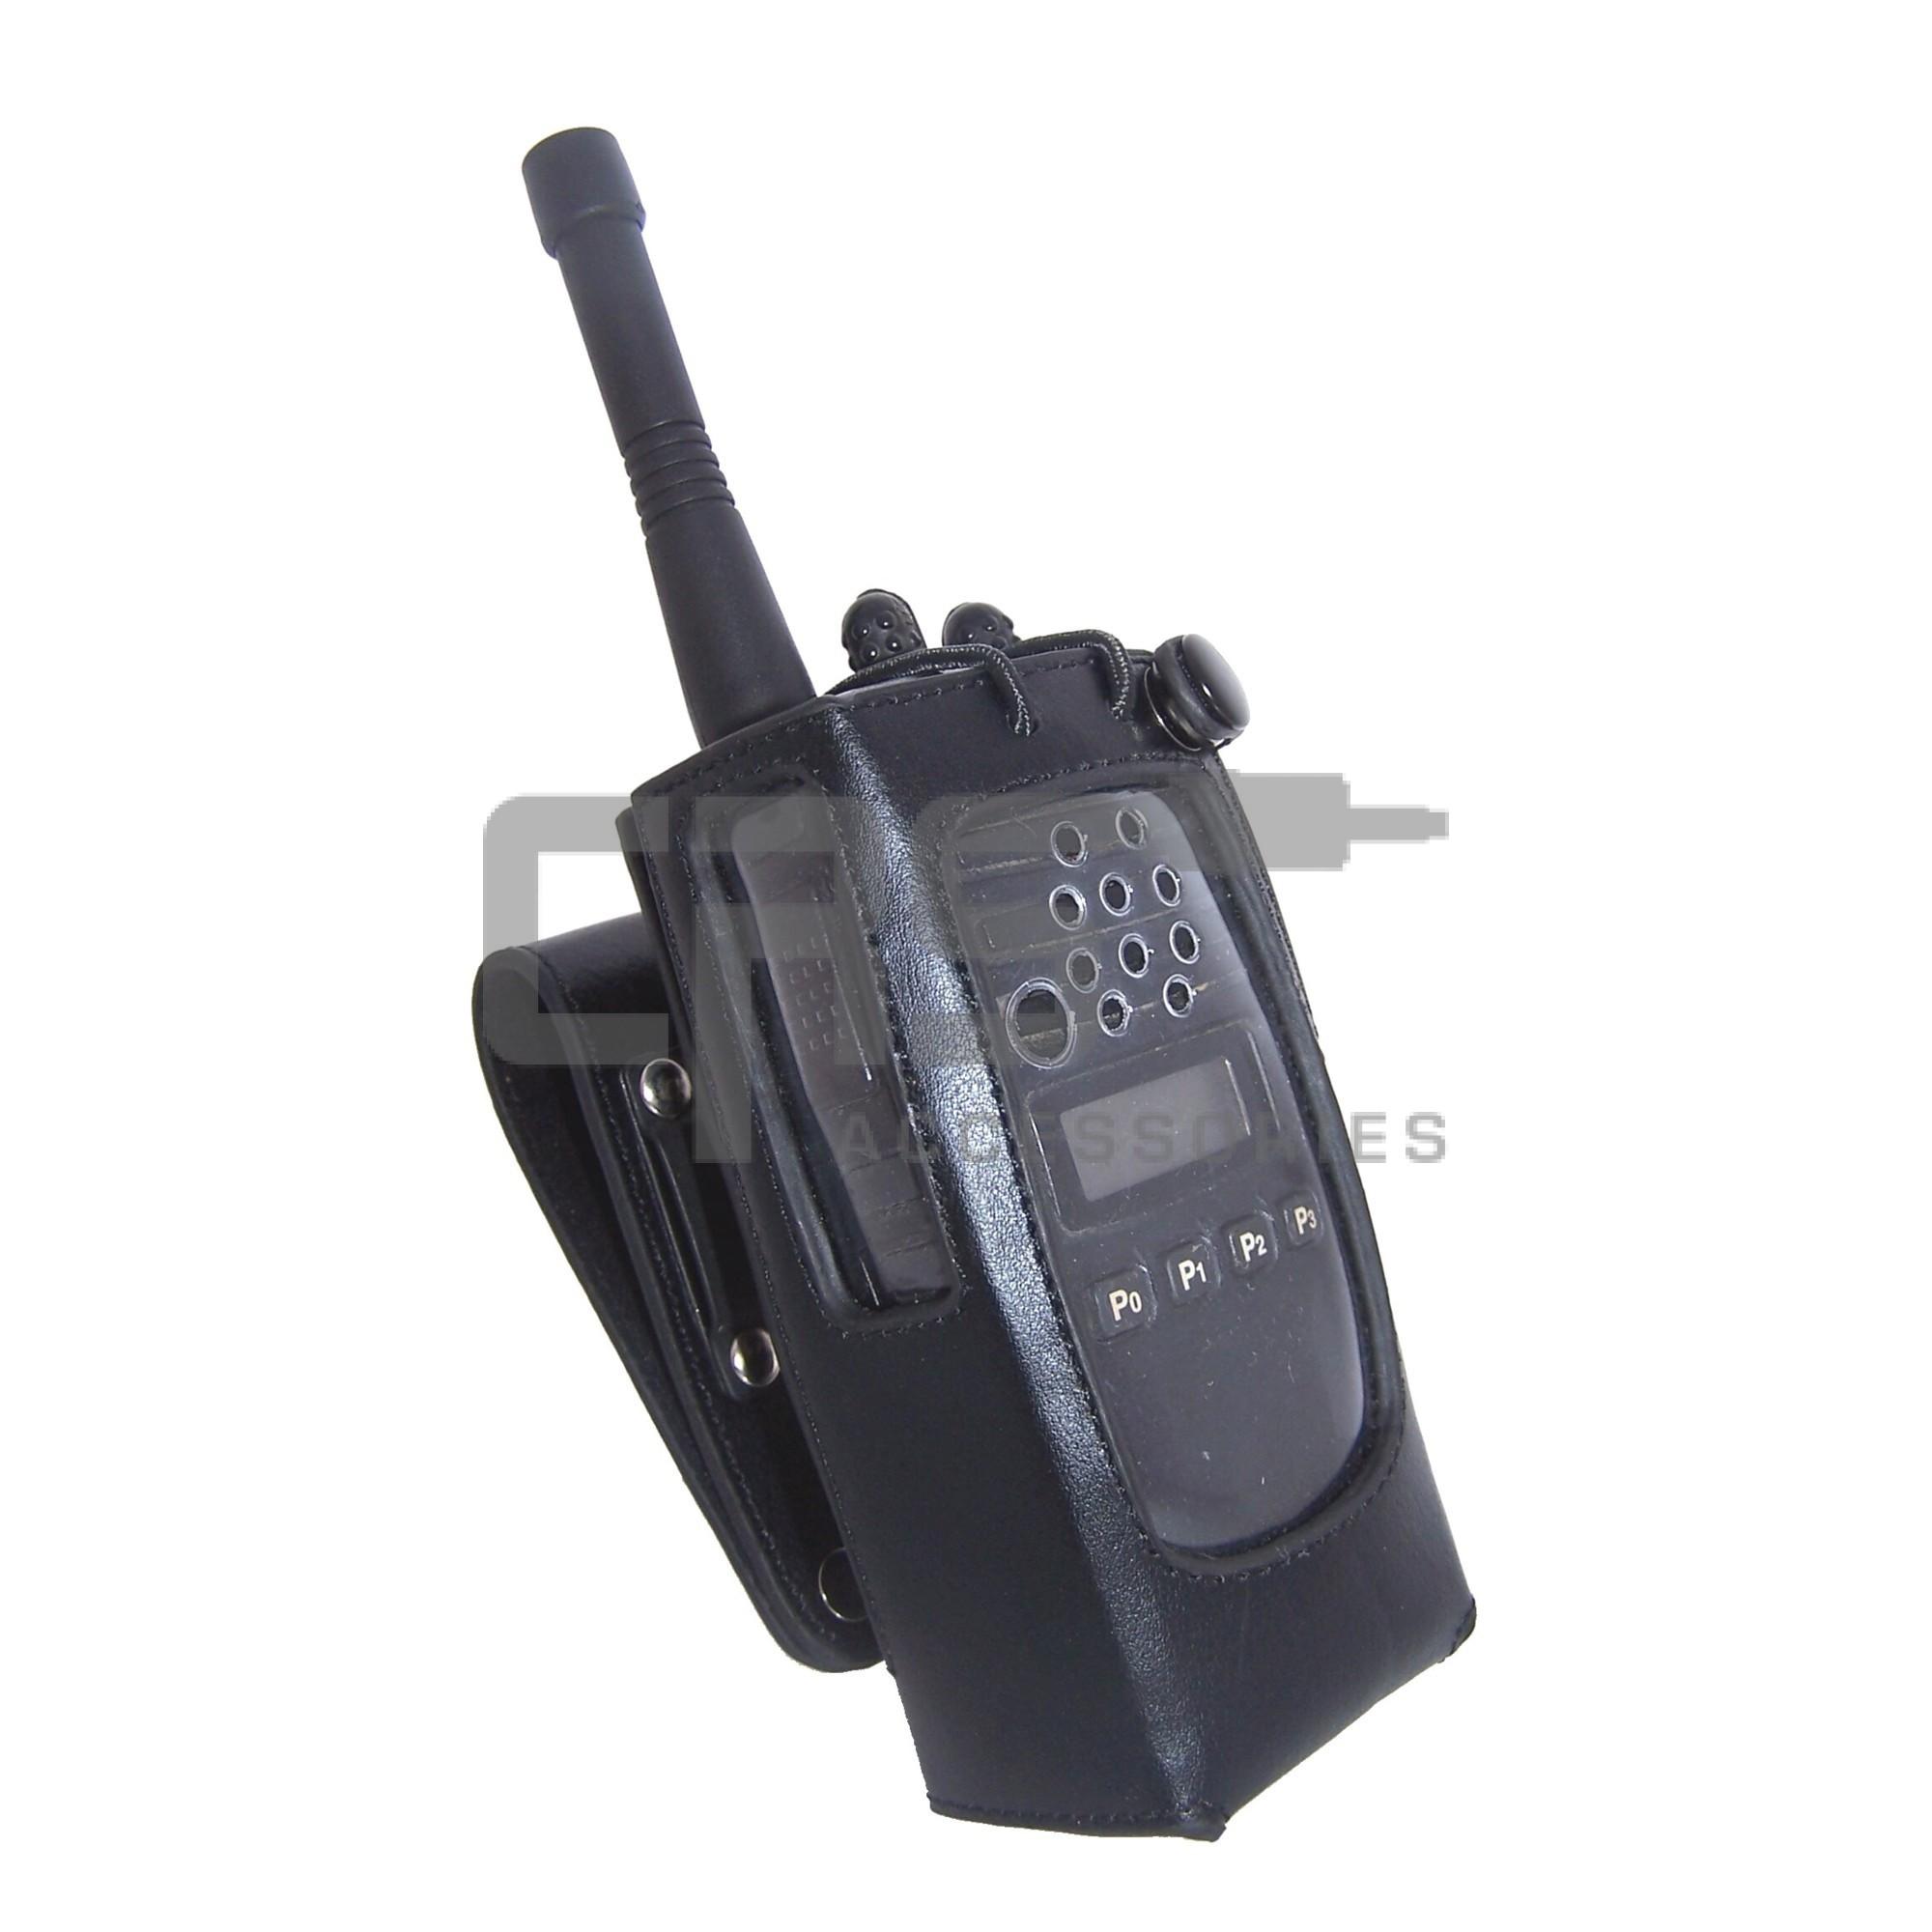 CRS Leather Case HD Swivel Loop & Belt Clip Suit Icom IC-41S/41W, Kenwood TK-3310 / 3317, 3207,  Motorola CP476 / DP2400